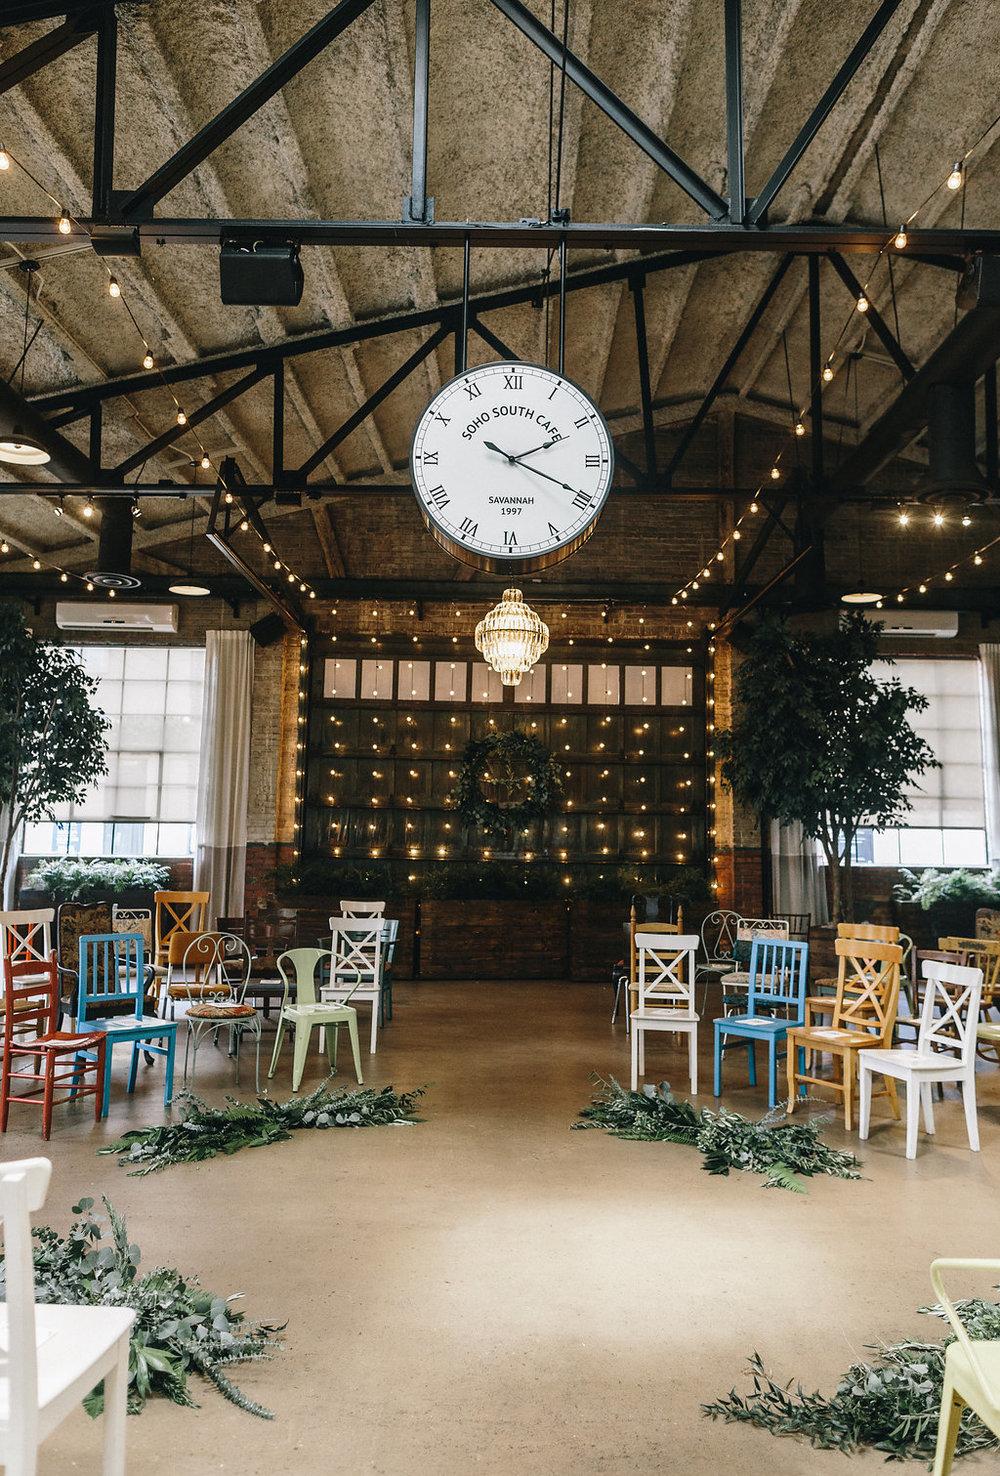 shannon-britt-mackensey-alexander-photography-green-wedding-shoes-ivory-and-beau-bridal-boutique-savannah-wedding-planner-savannah-bridal-boutique-savannah-wedding-dresses-savannah-florist-summer-solstice-wedding-boho-soho-south-cafe-wedding-43.jpg